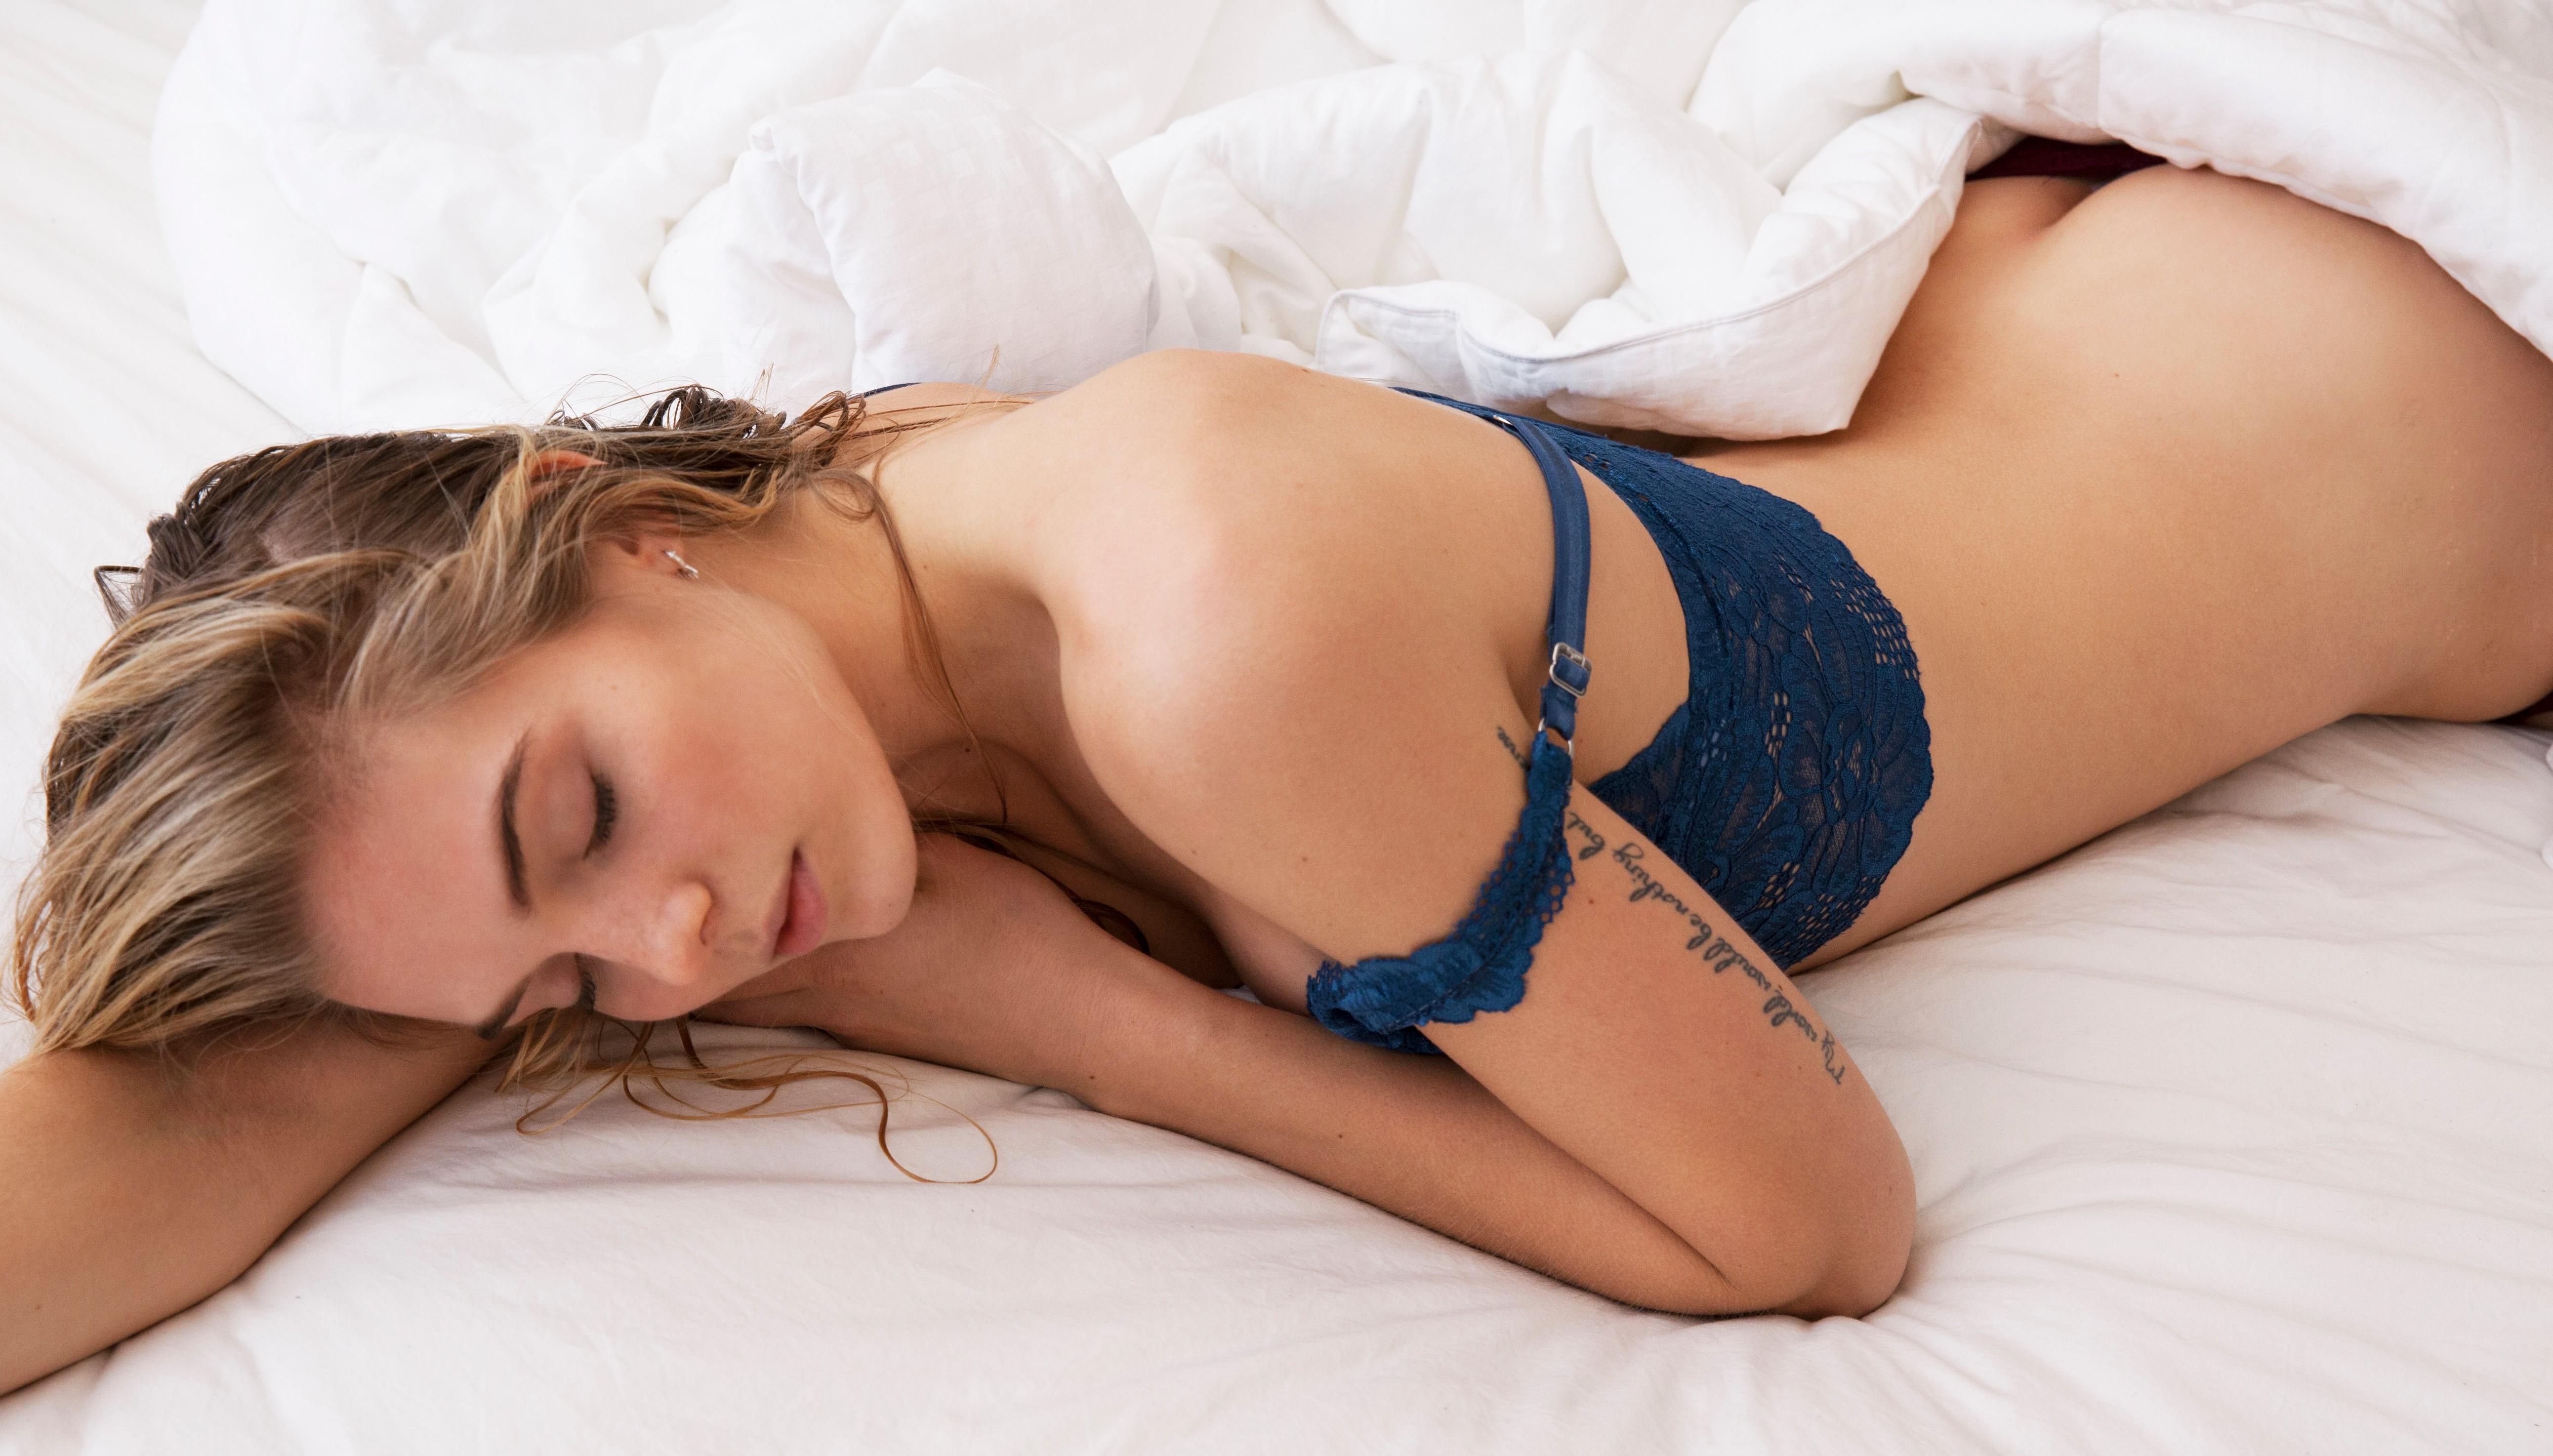 JordanMurray_Lingere_BedSheets_Sleeping